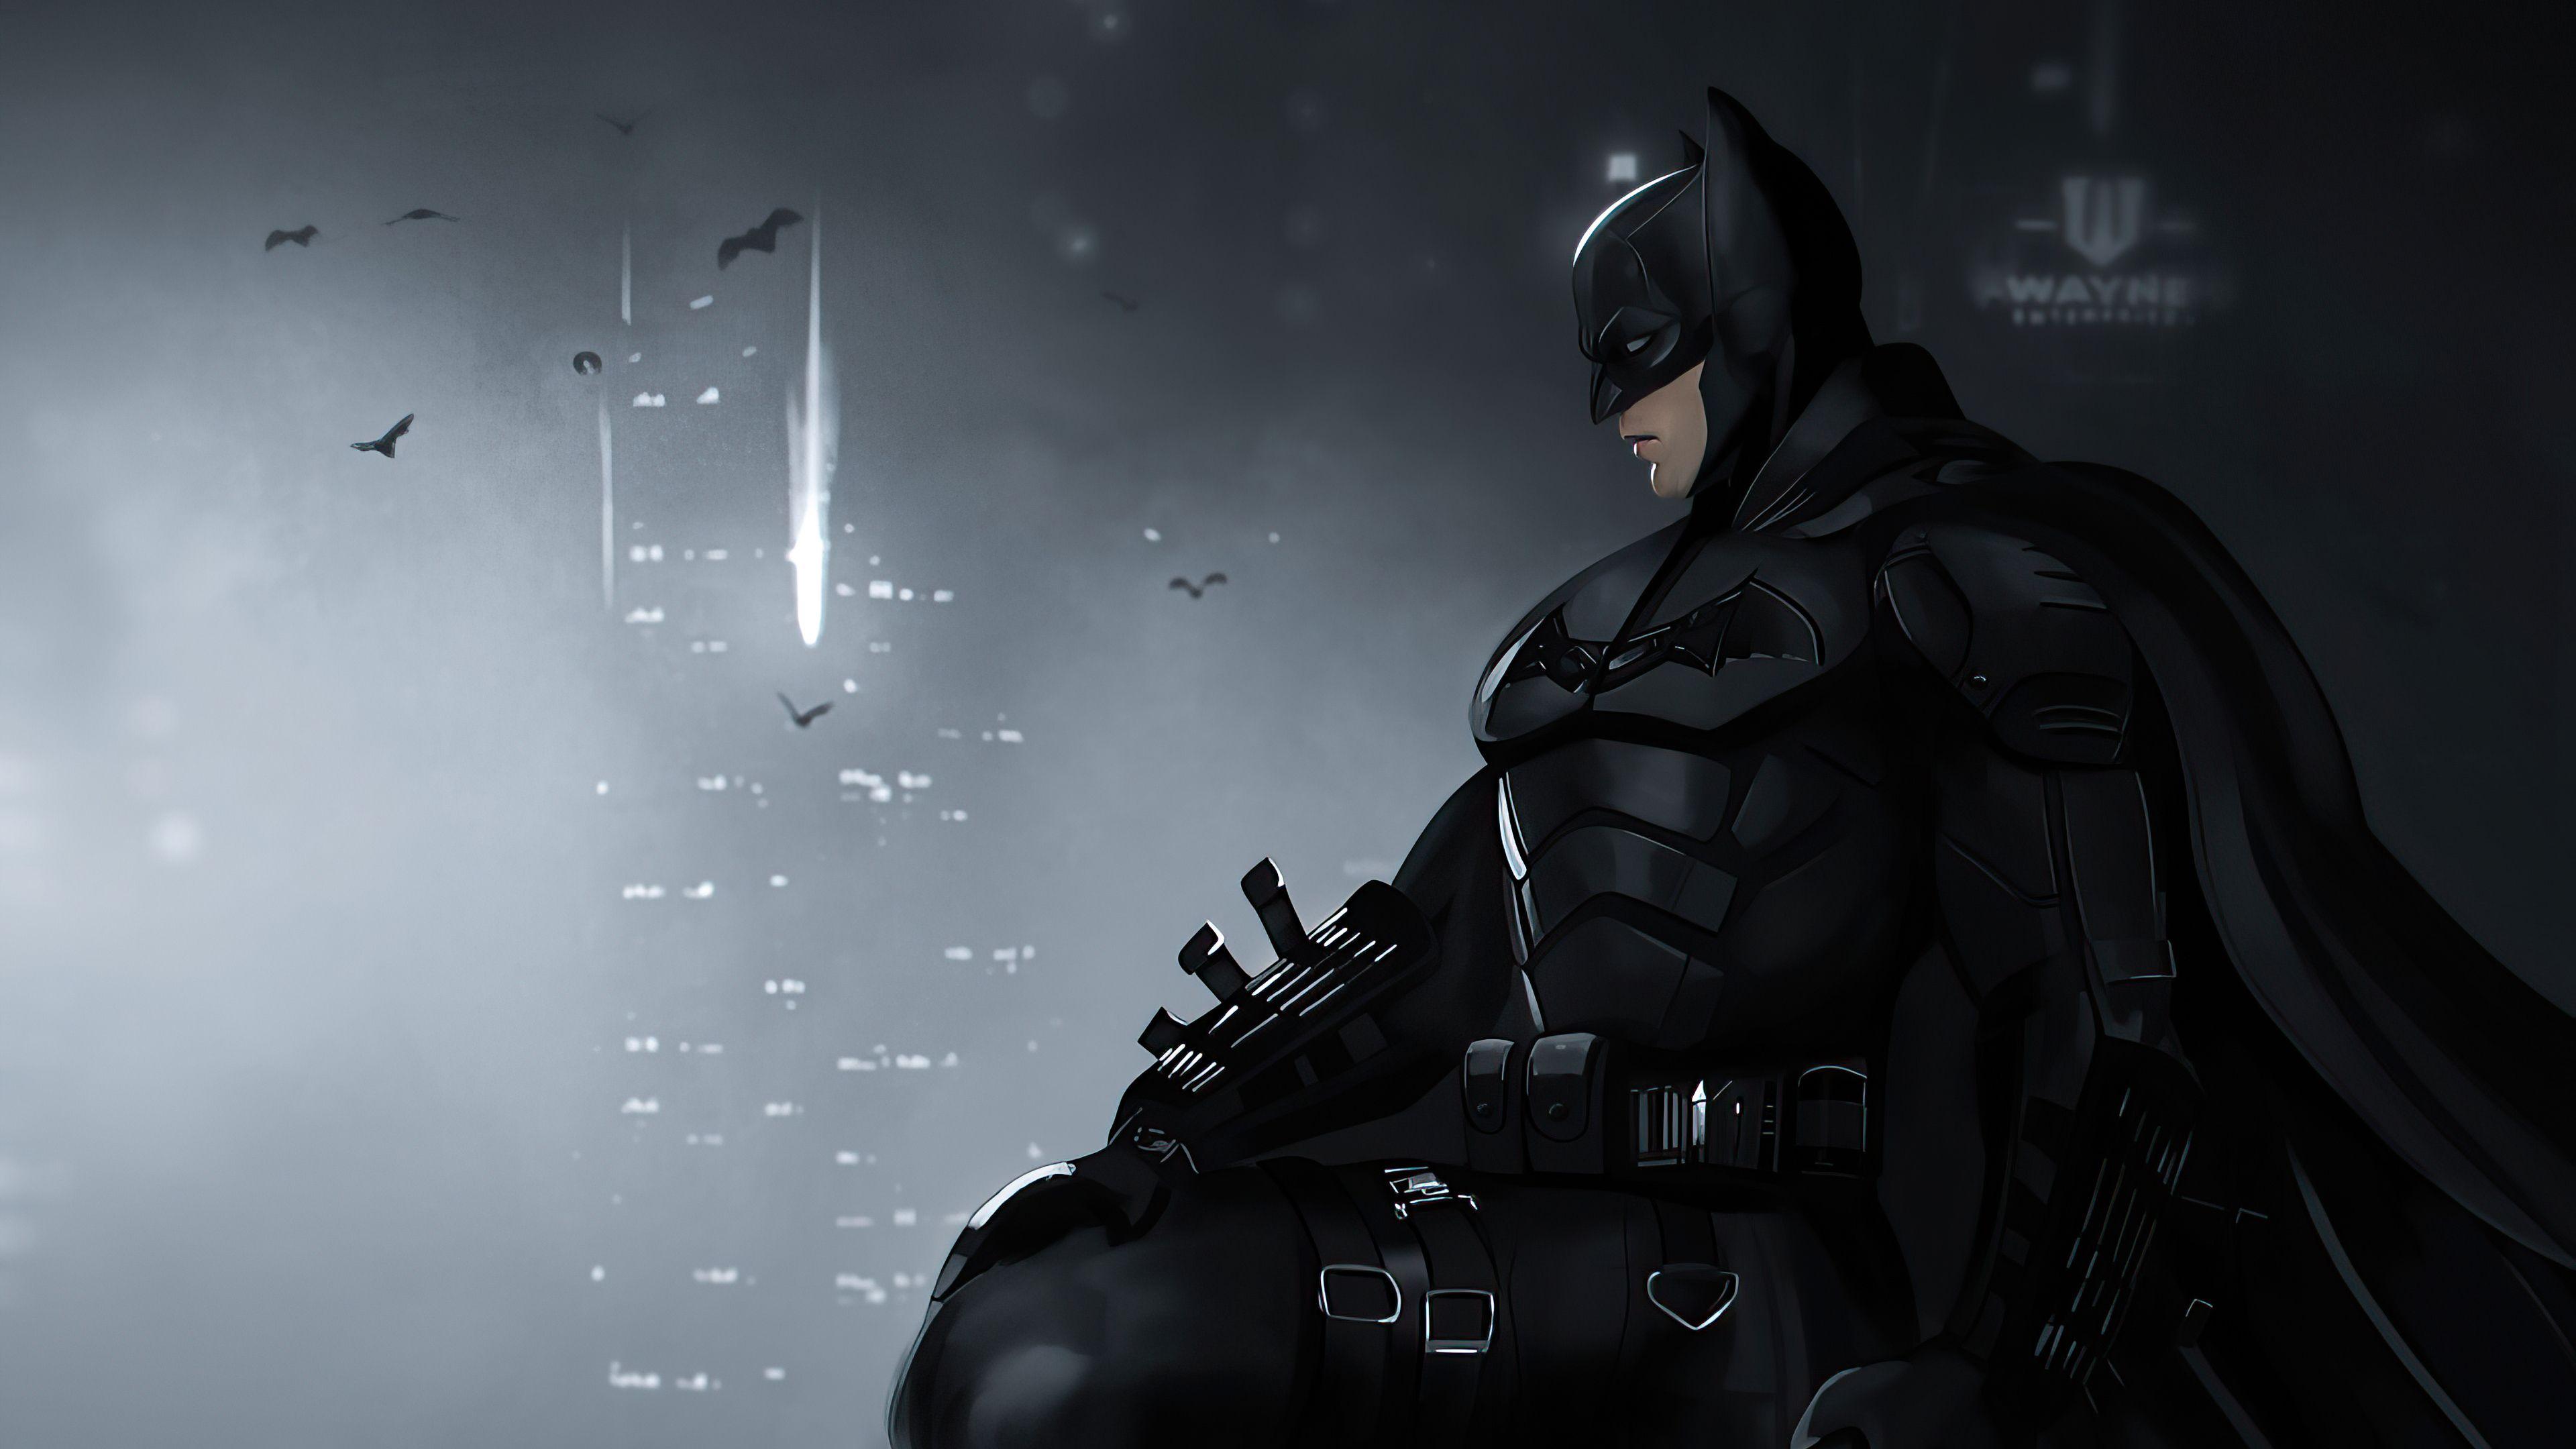 Batman 2021 Desktop Wallpapers 3840x2160